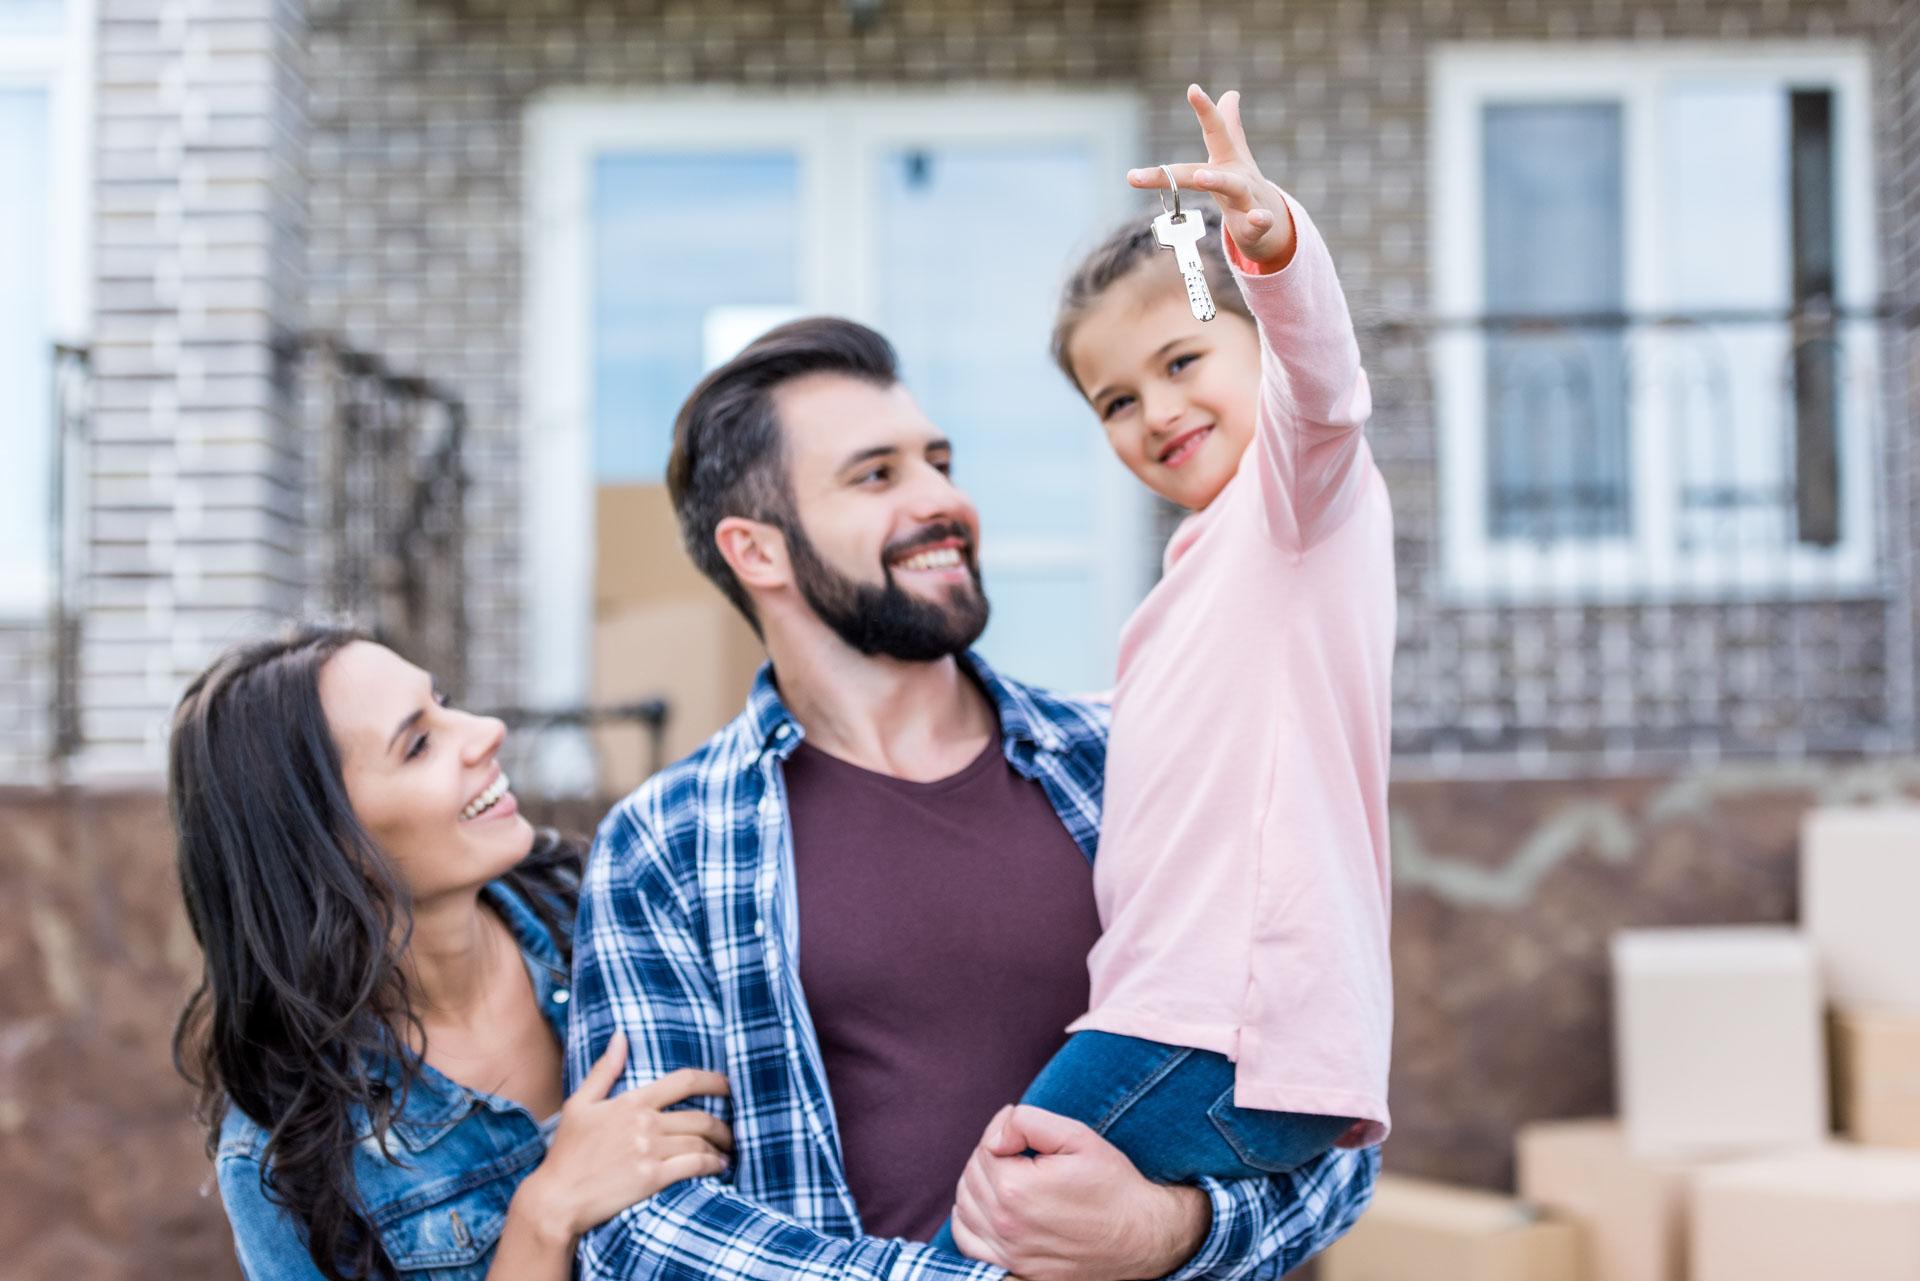 Familie zieht in neues Haus